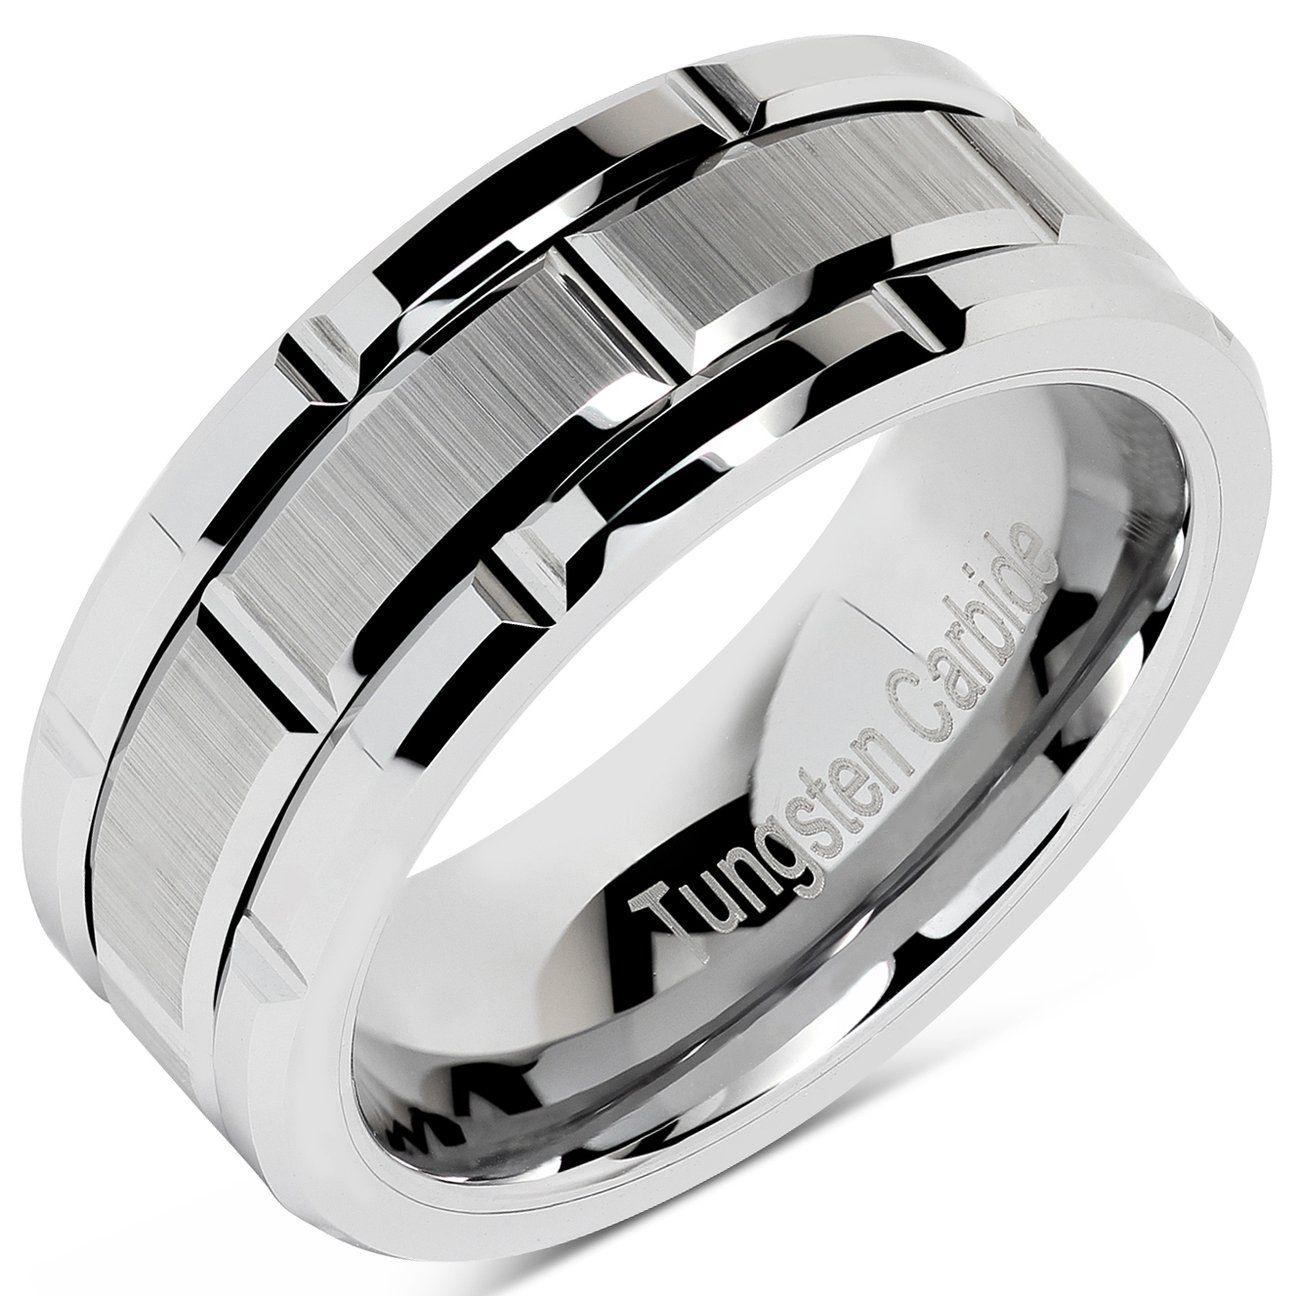 Tungsten Rings for Men Wedding Band Silver Brick Pattern